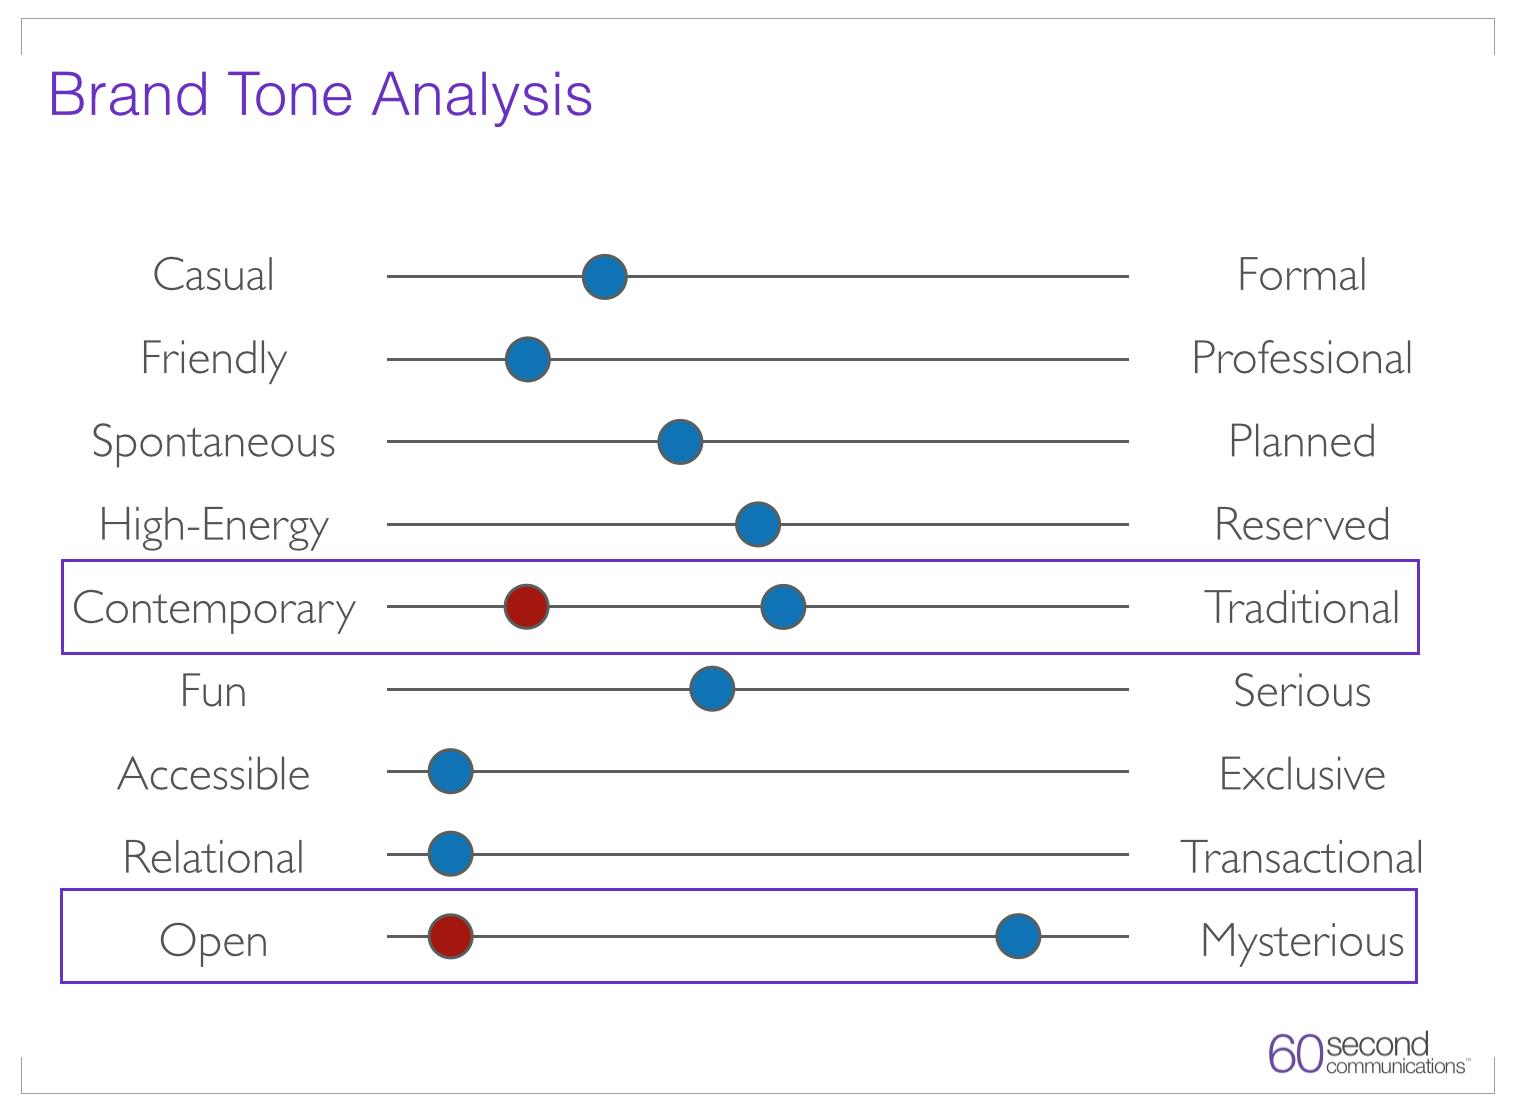 Image of Brand Tone